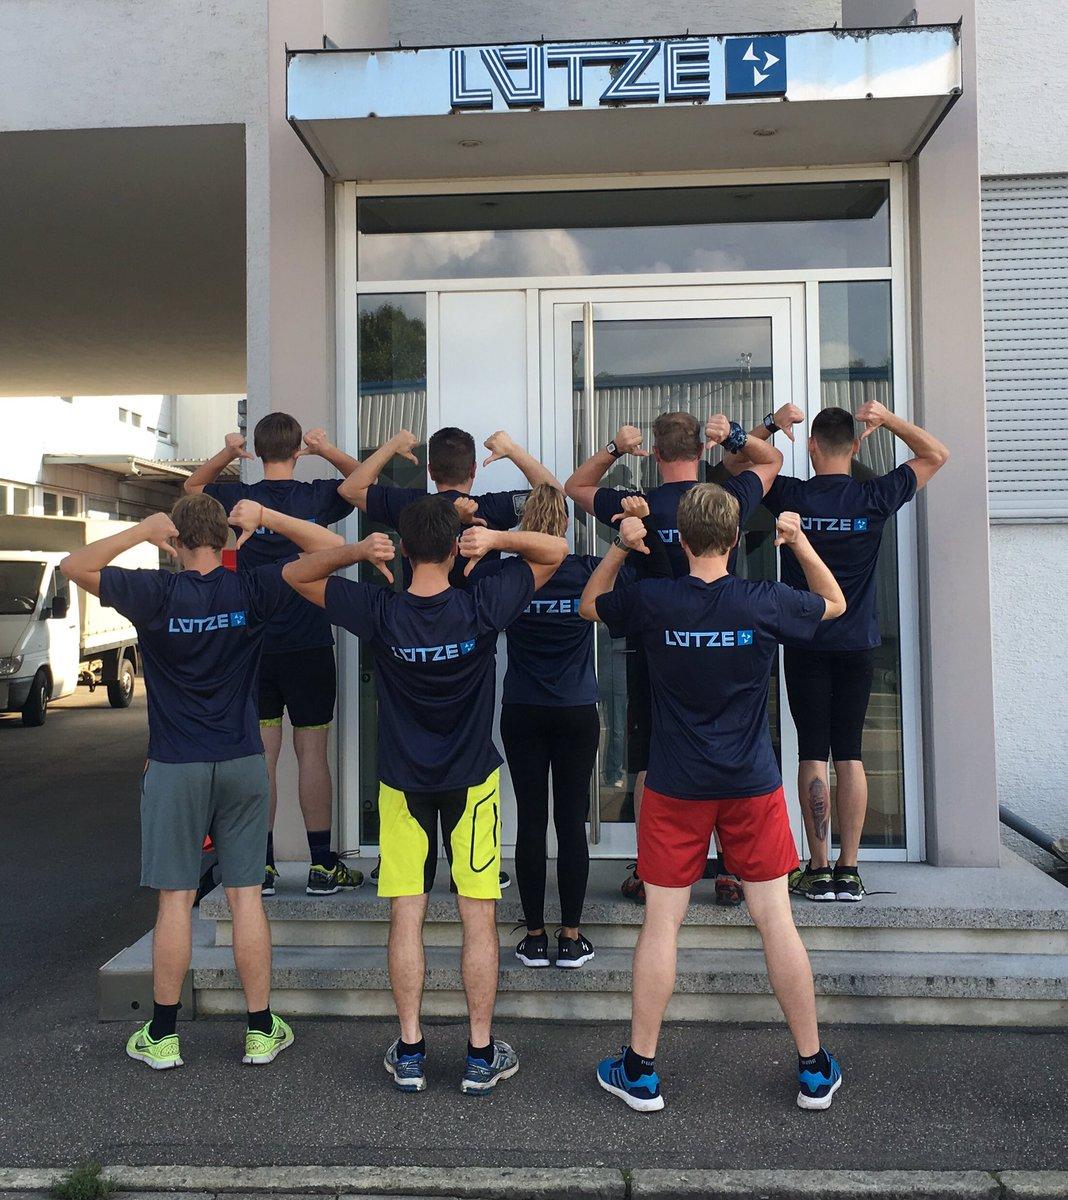 Heute ist Waiblinger #Firmenlauf - Wir wünschen dem LÜTZE-Team viel Erfolg 💪💪💪...